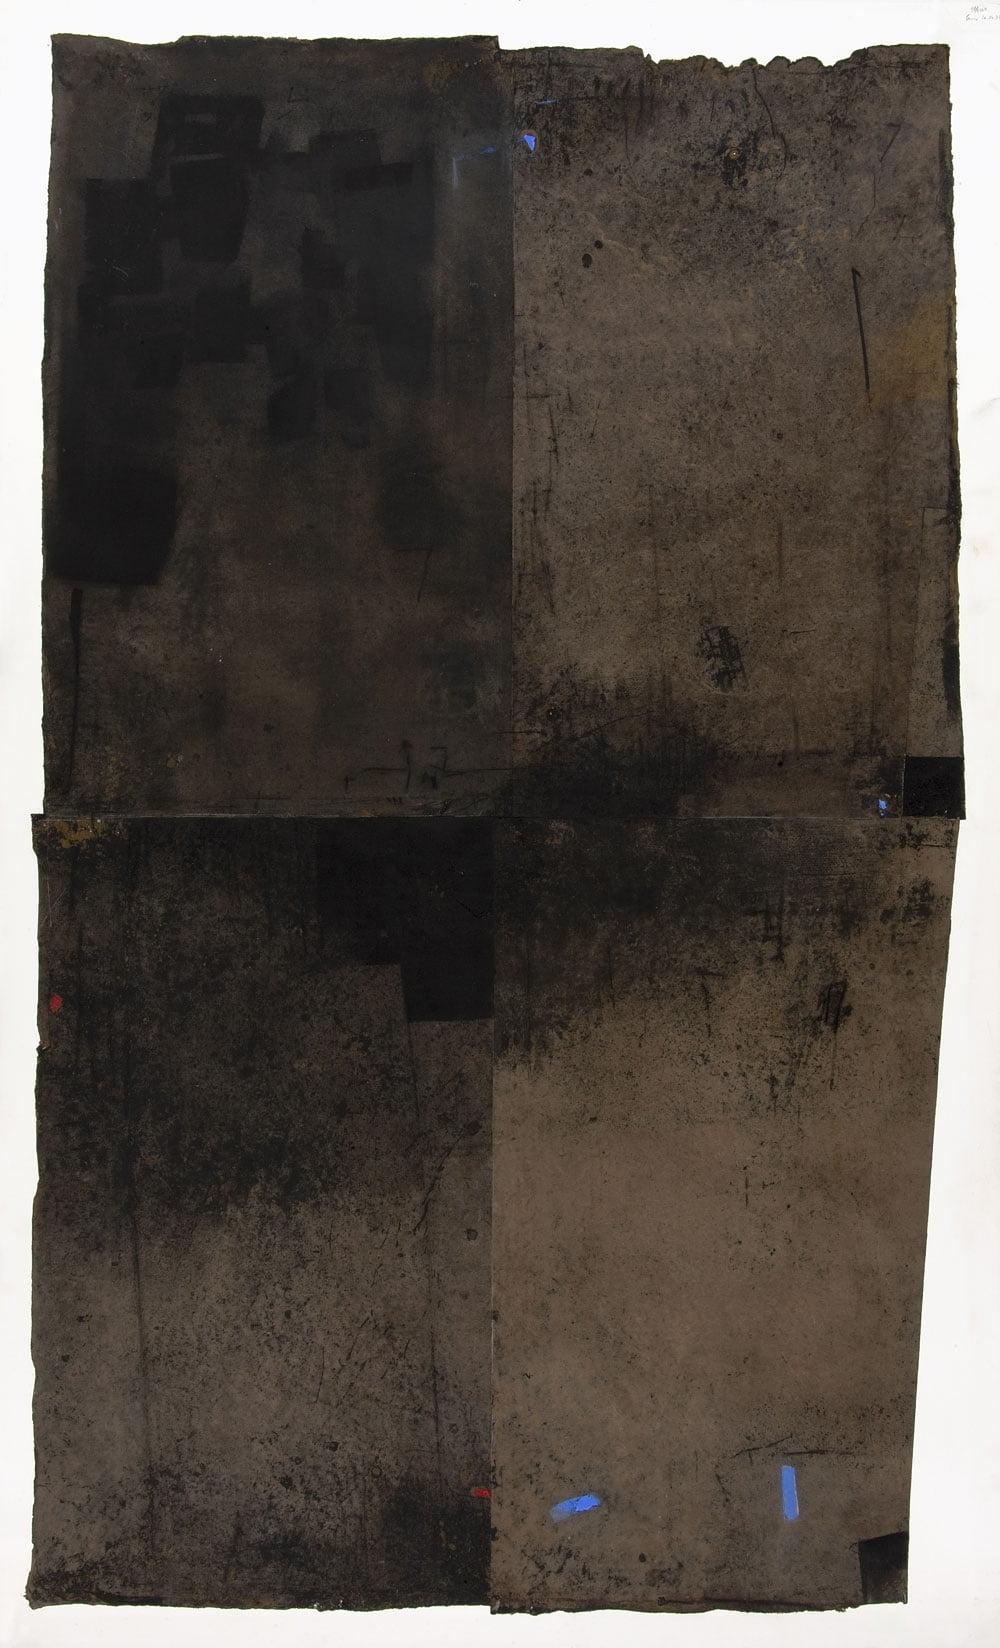 jean louis espilit galerie 21 oeuvre 11